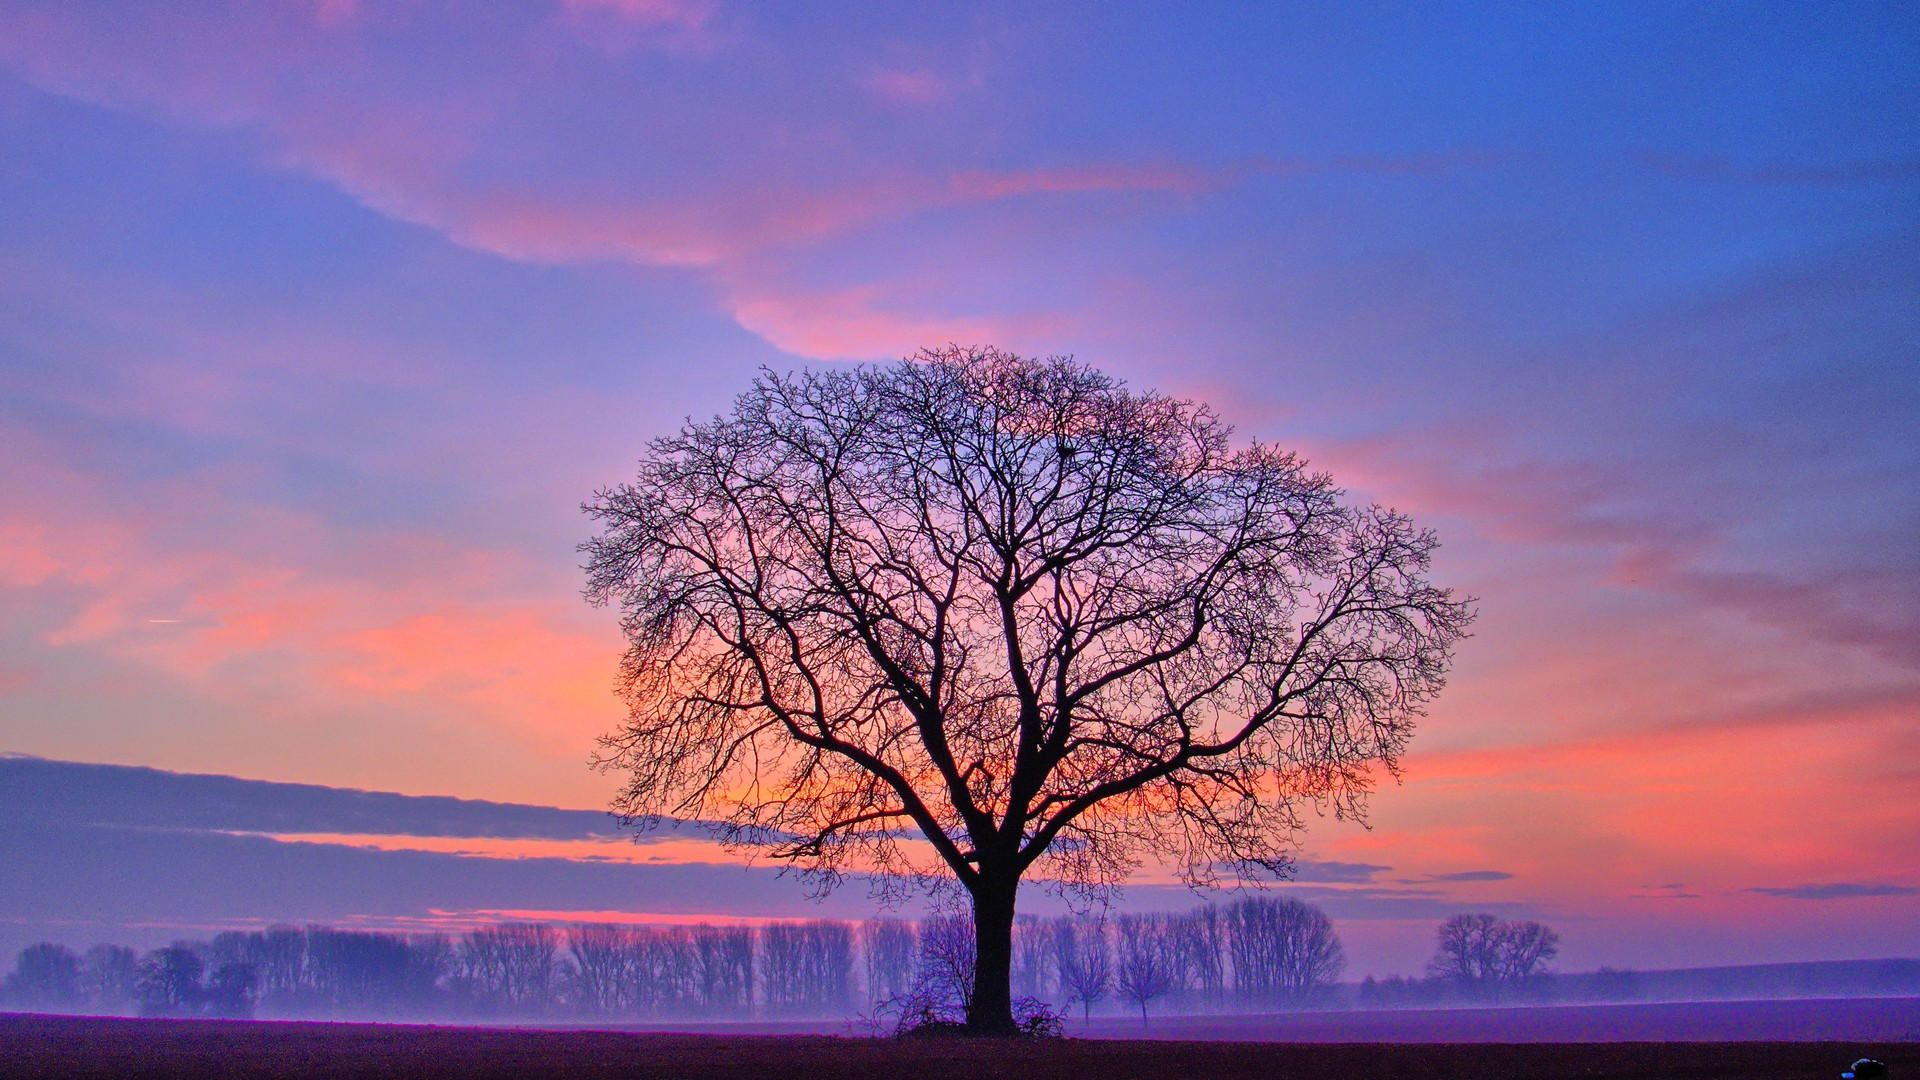 ansel-adams-photography-winter-trees